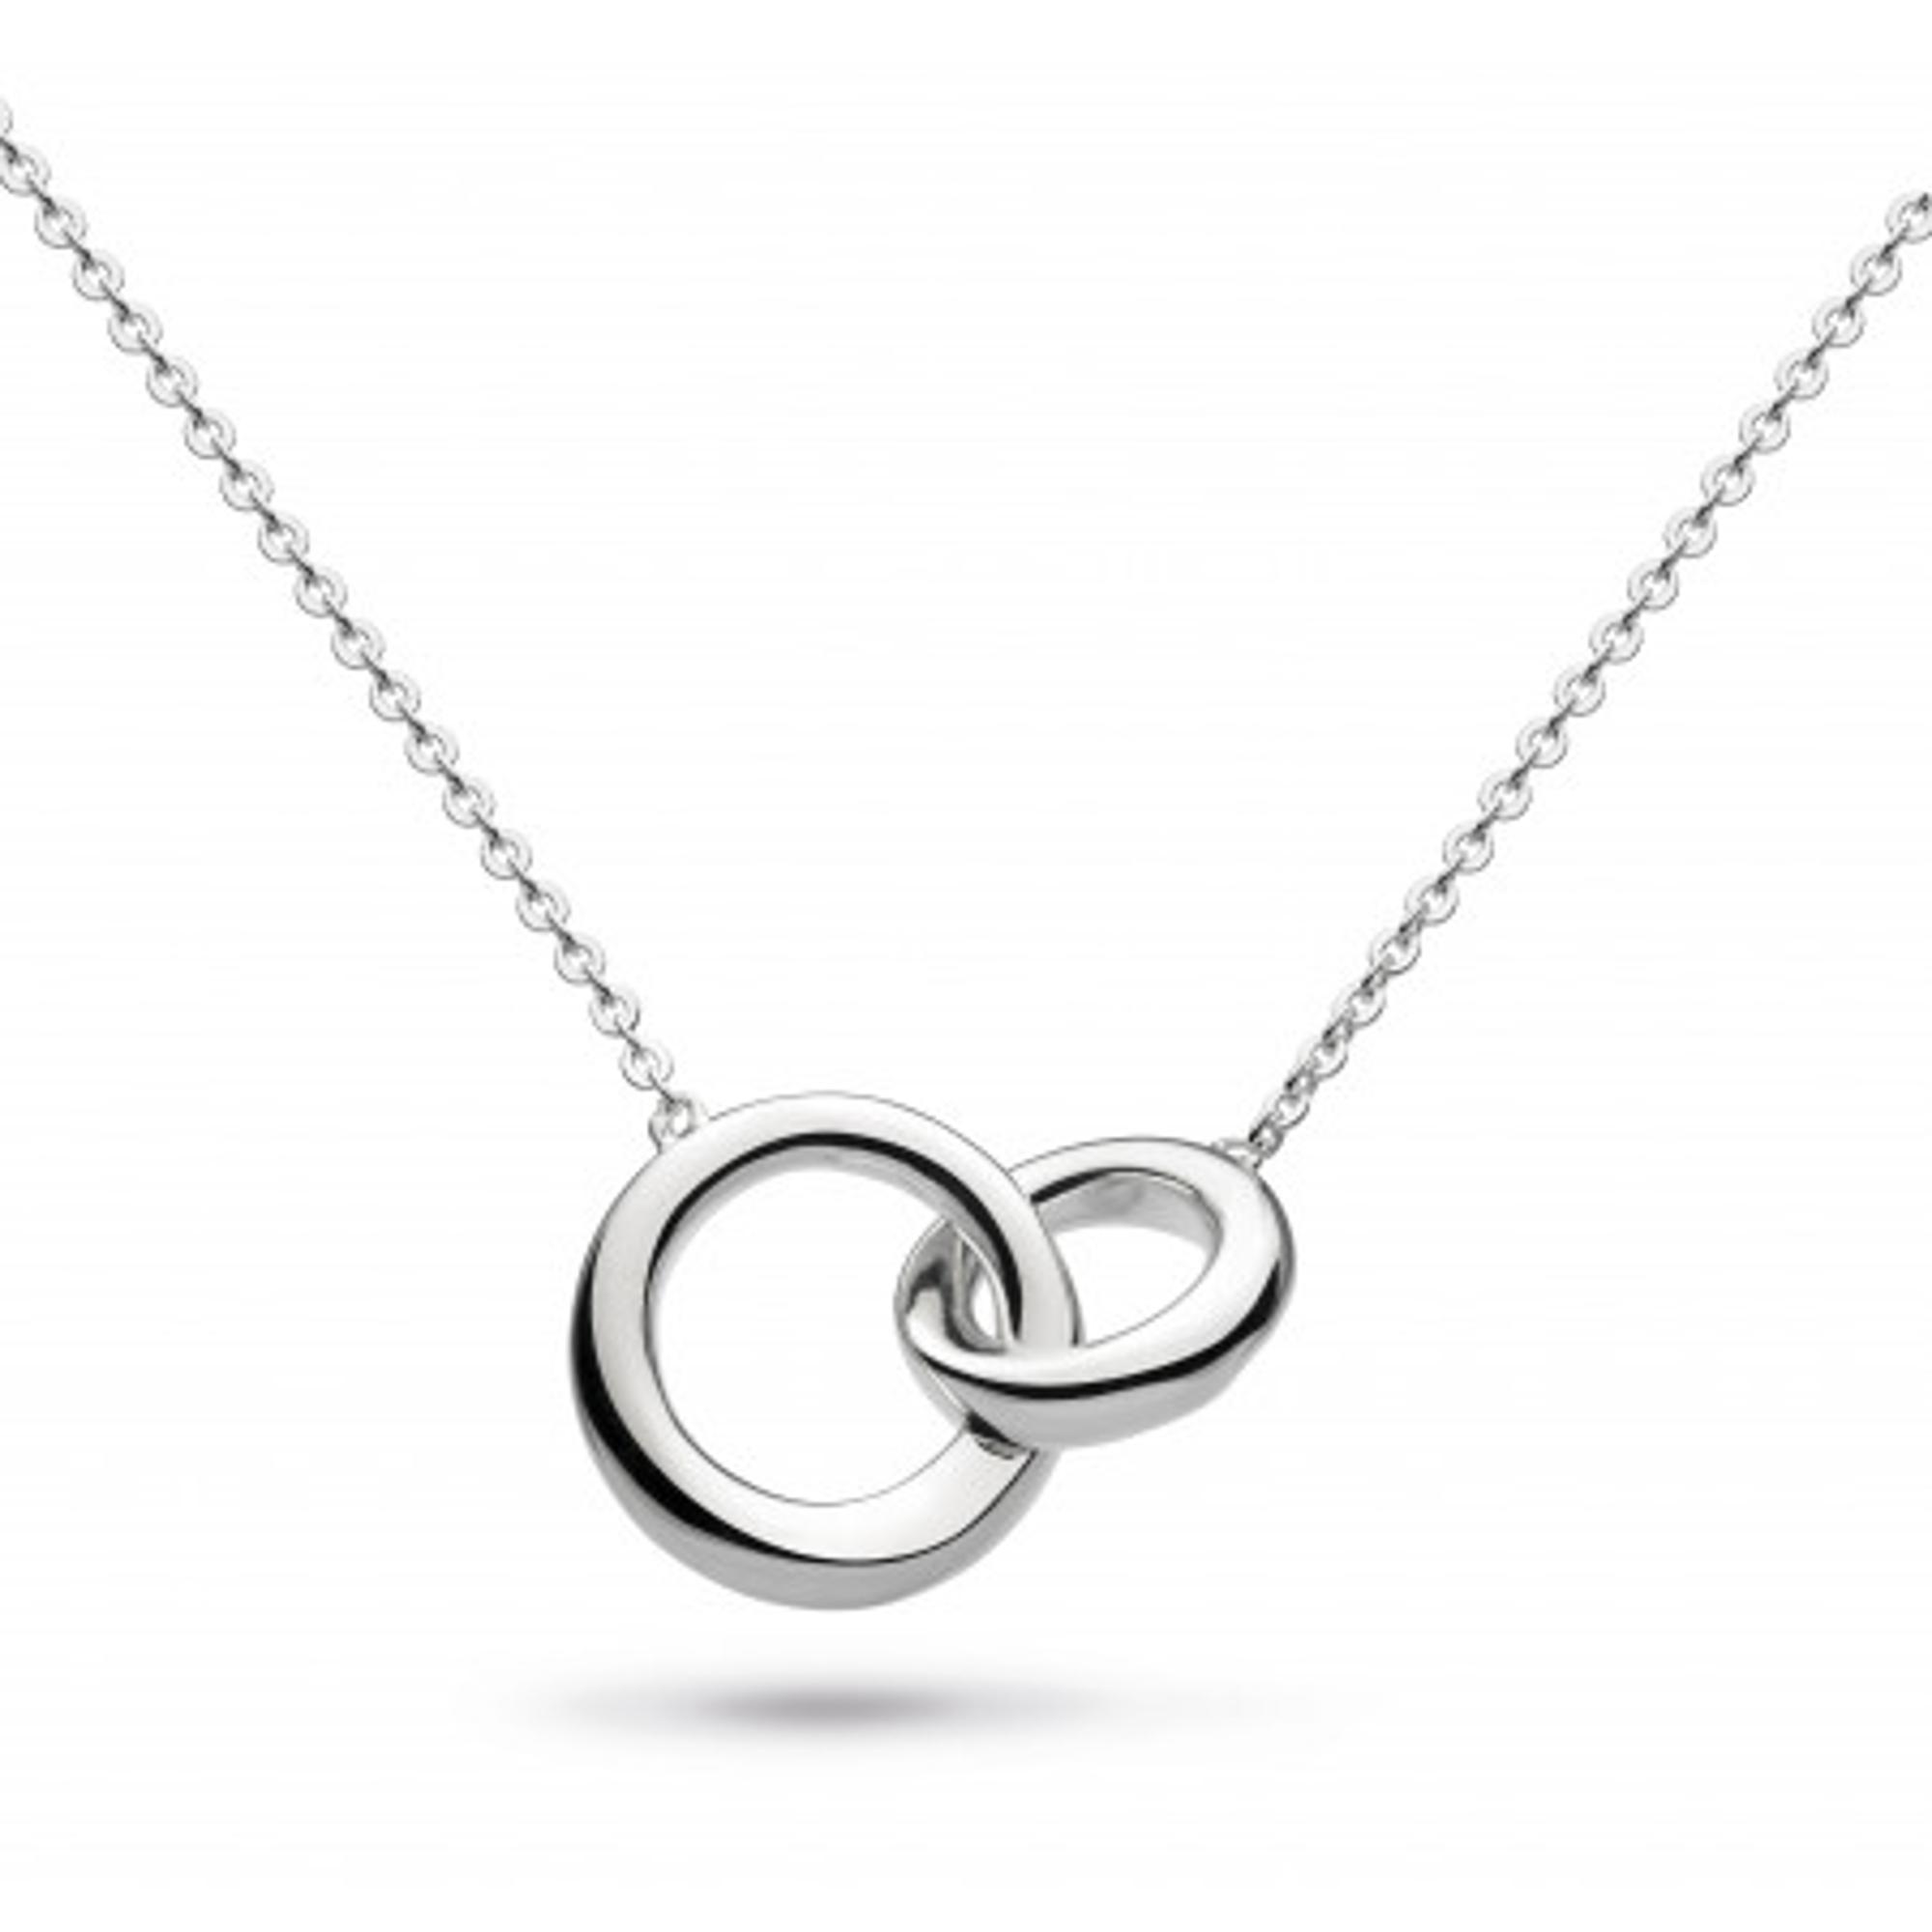 Kit Heath Sterling Silver Interlocking Bevel Curve Necklace